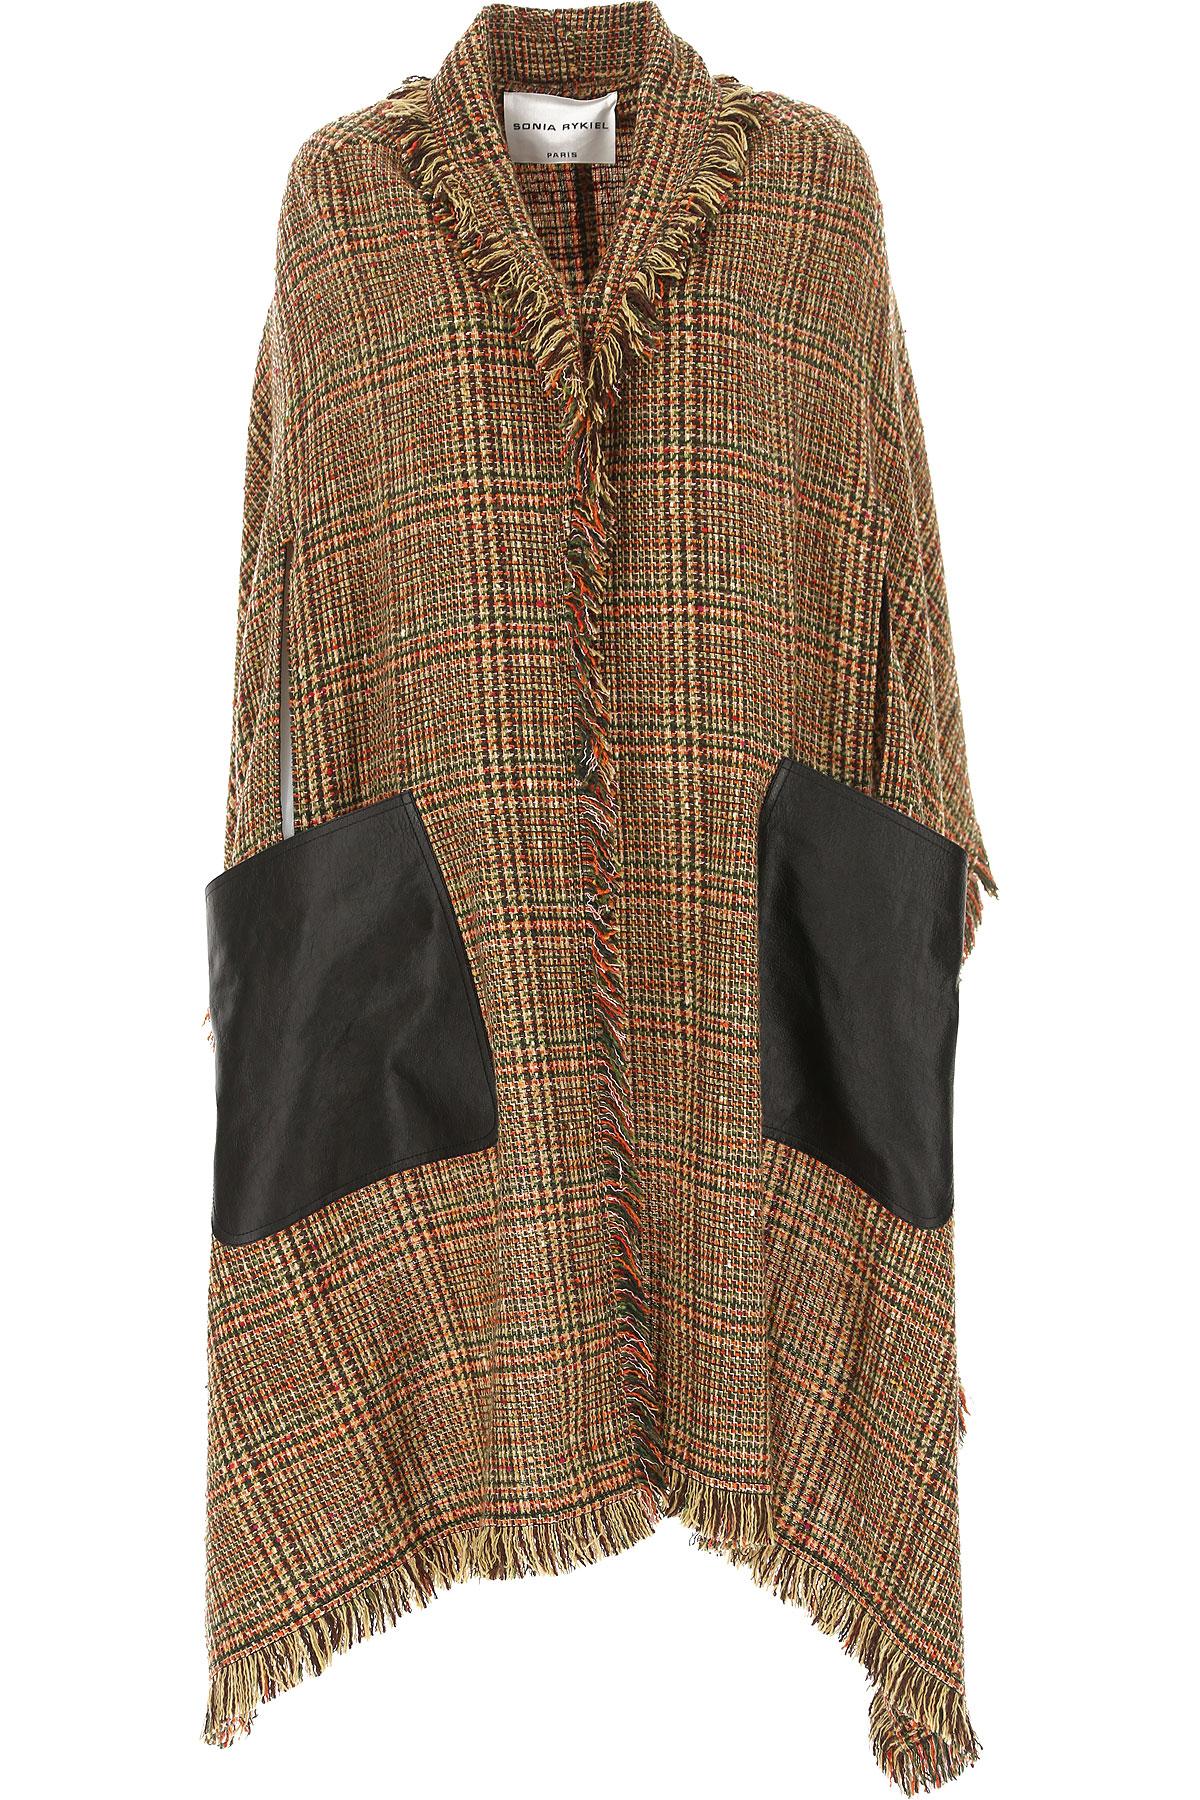 Image of Sonia Rykiel Jacket for Women, Multicolor, Wool, 2017